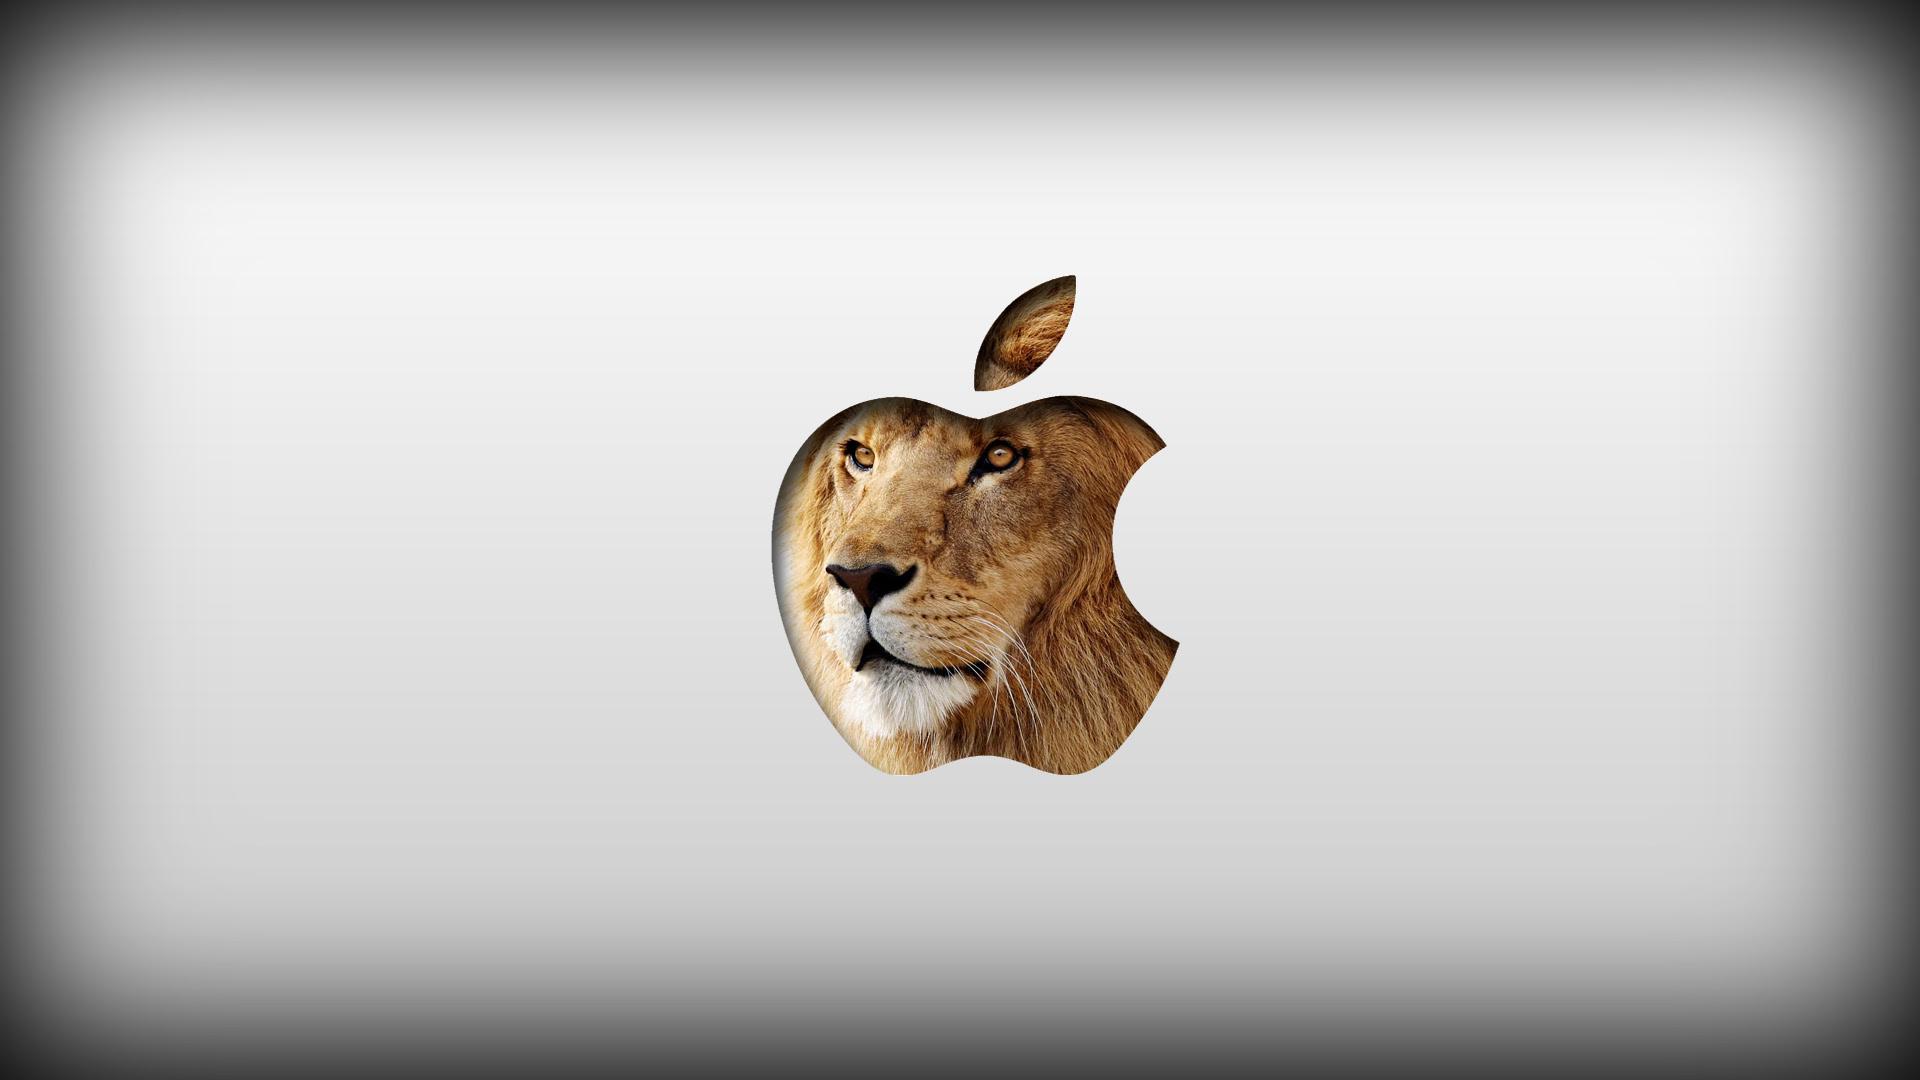 Macos Mountain Lion Wallpaper